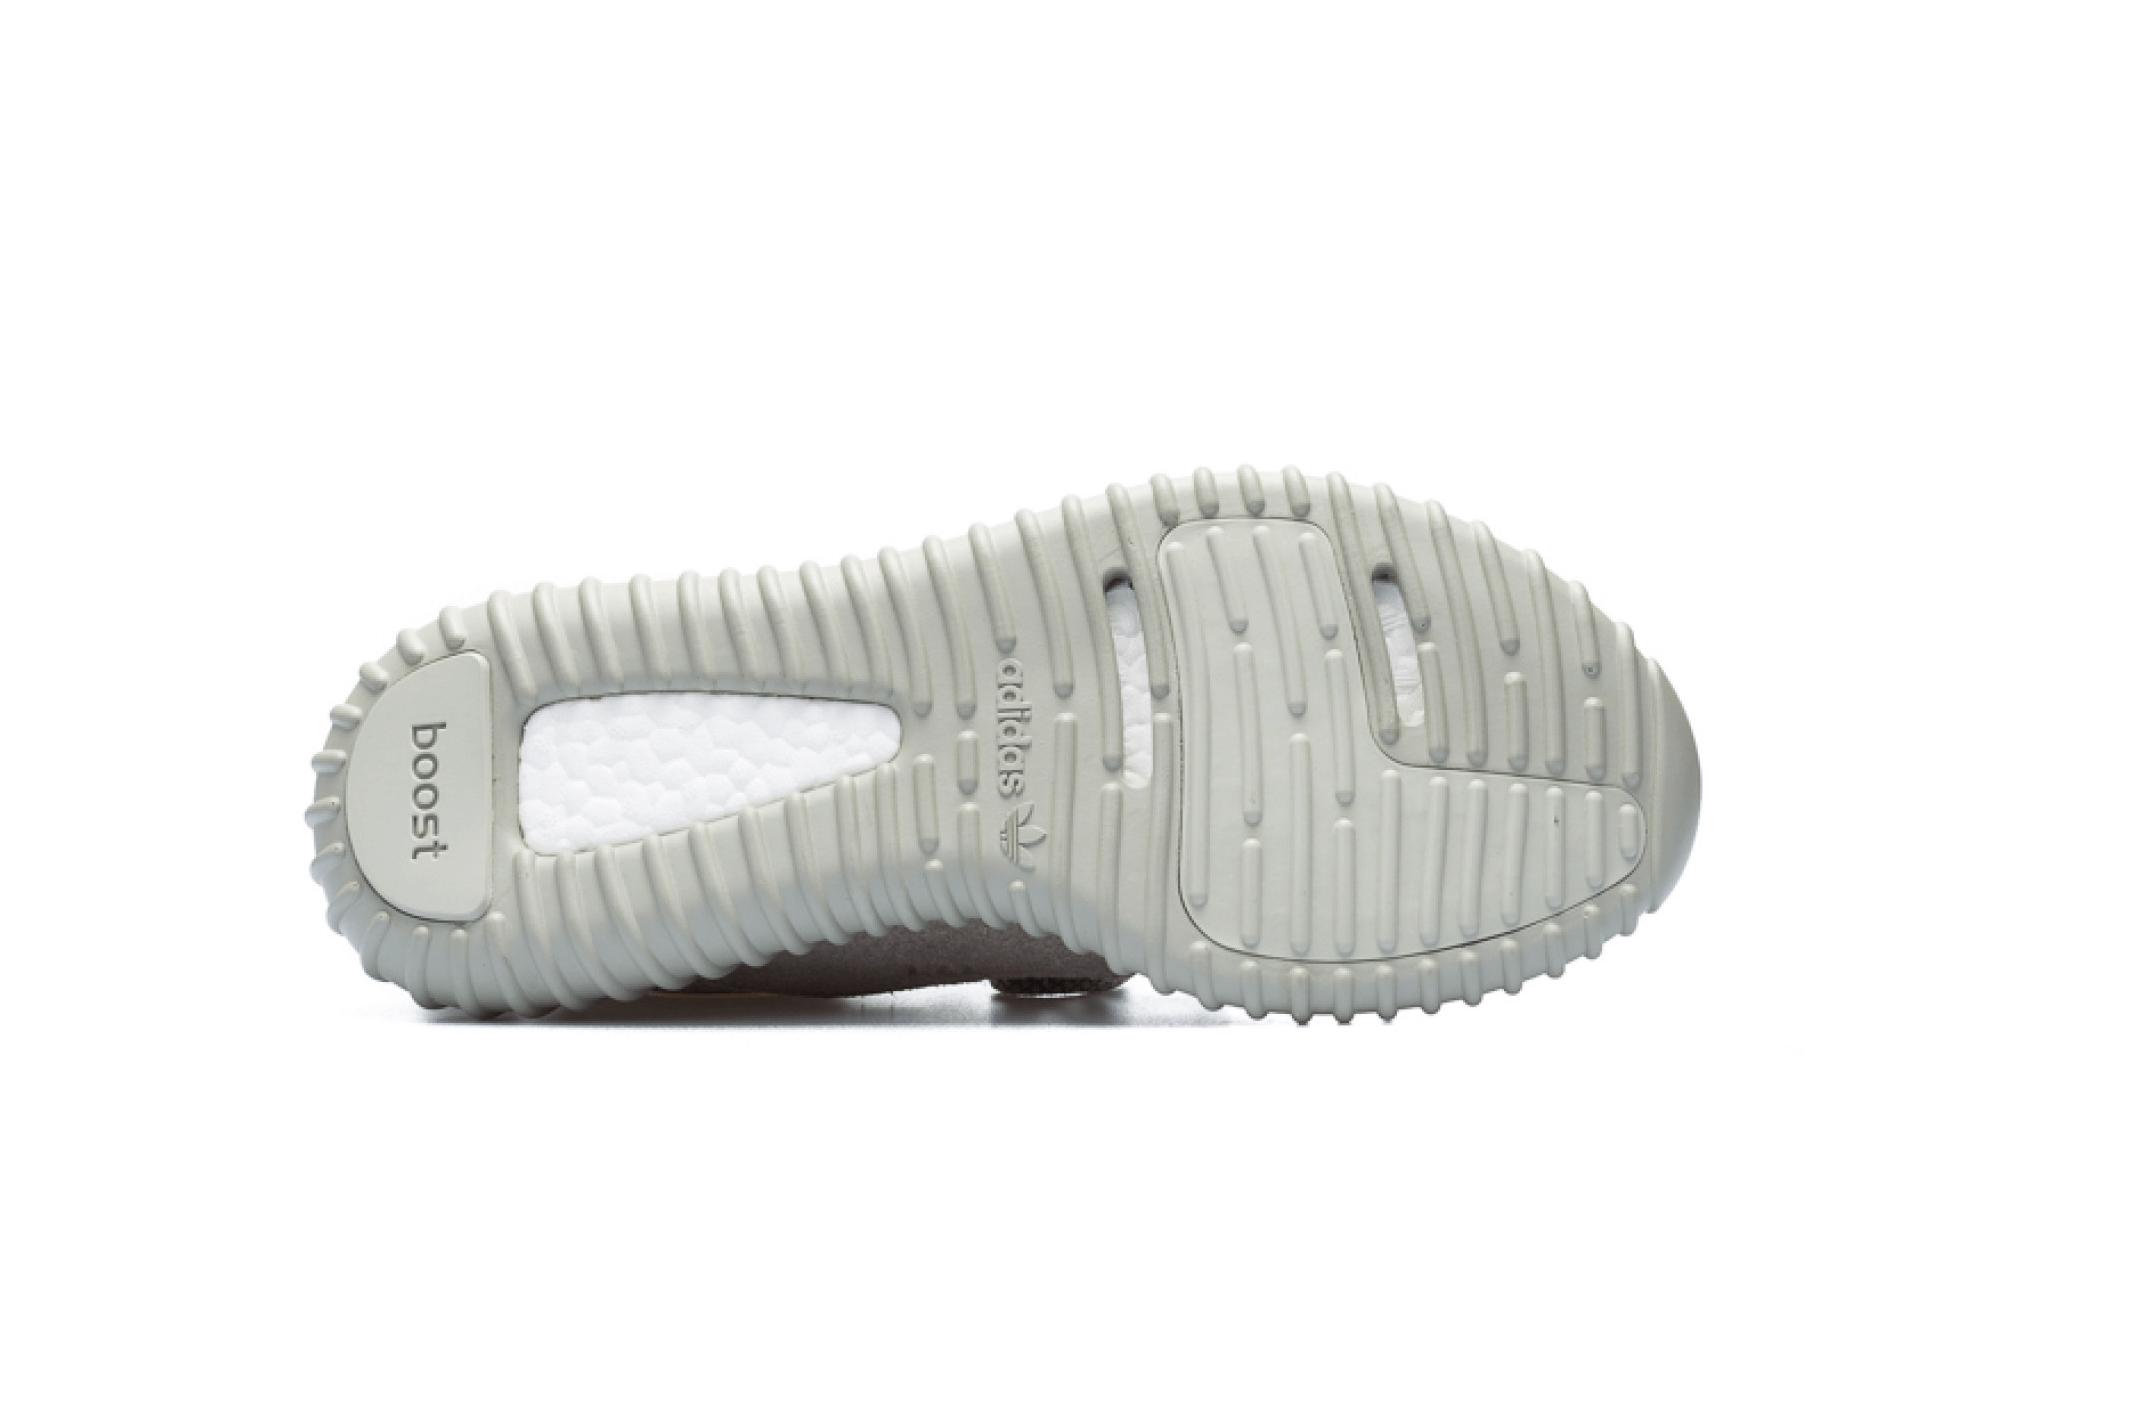 101c37ac8 Adidas Yeezy Boost 350 Moonrock – Kerimago